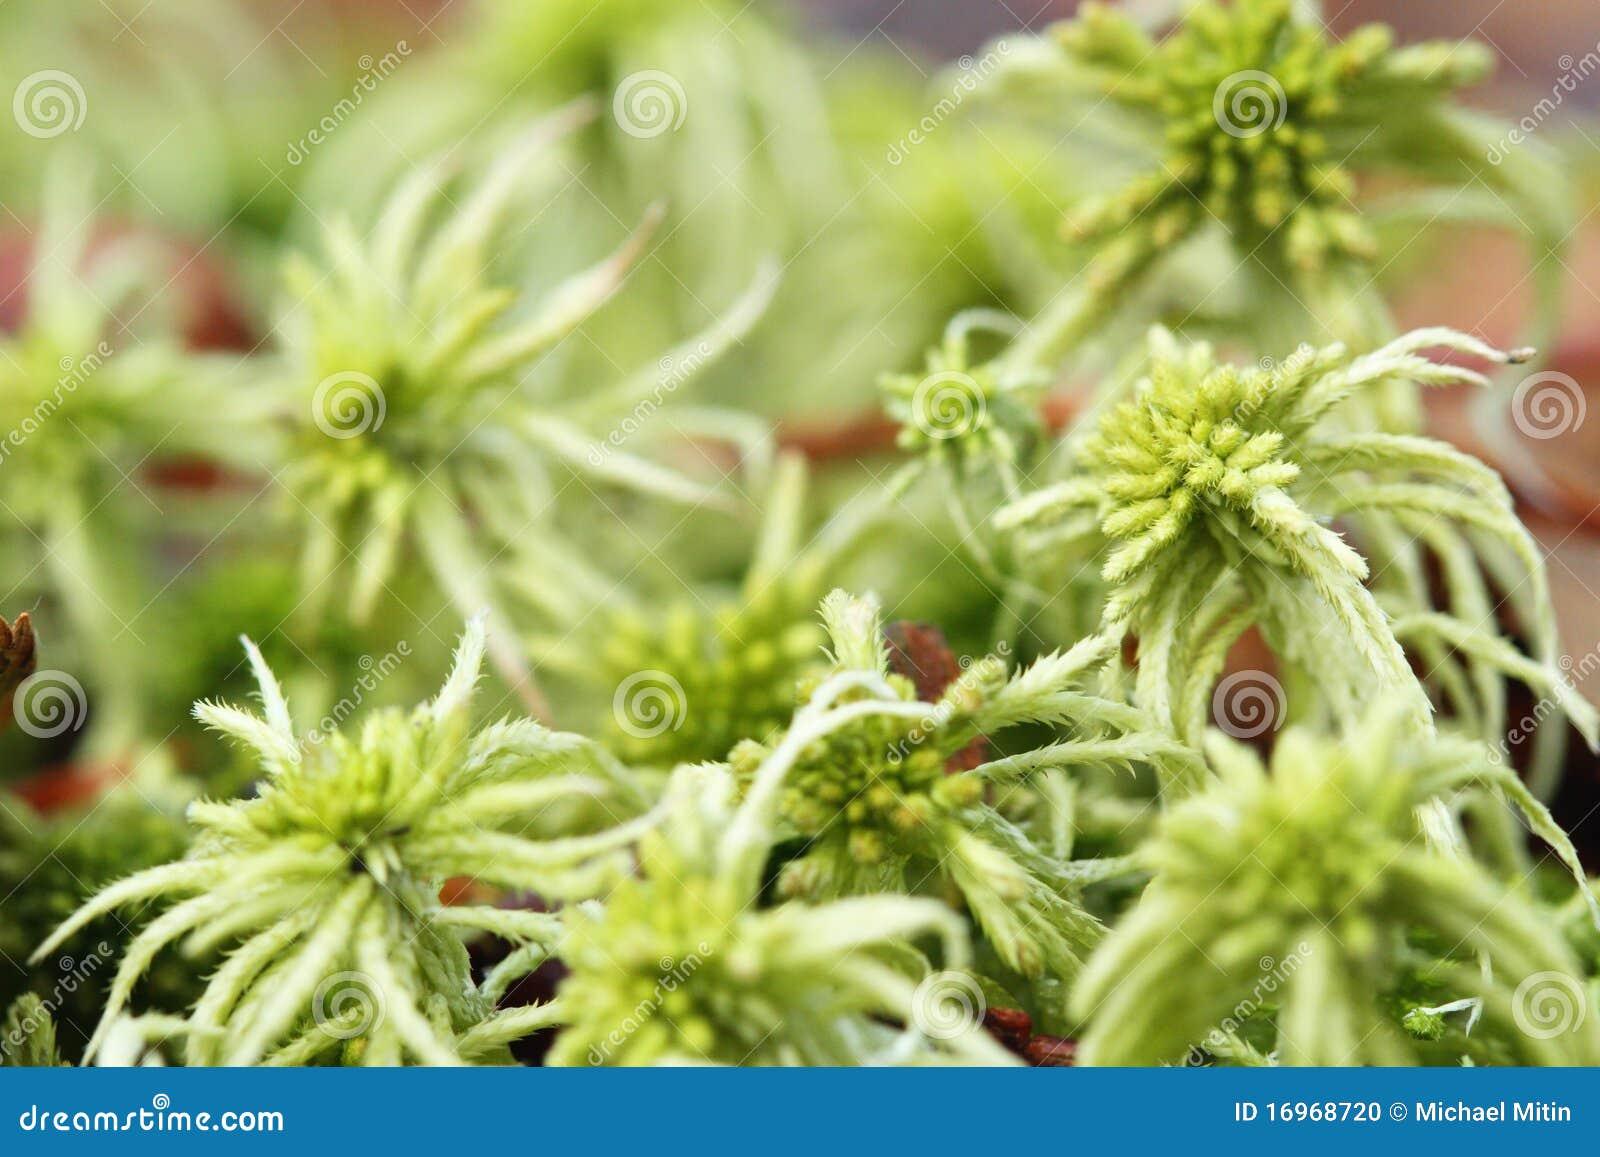 how to grow peat moss